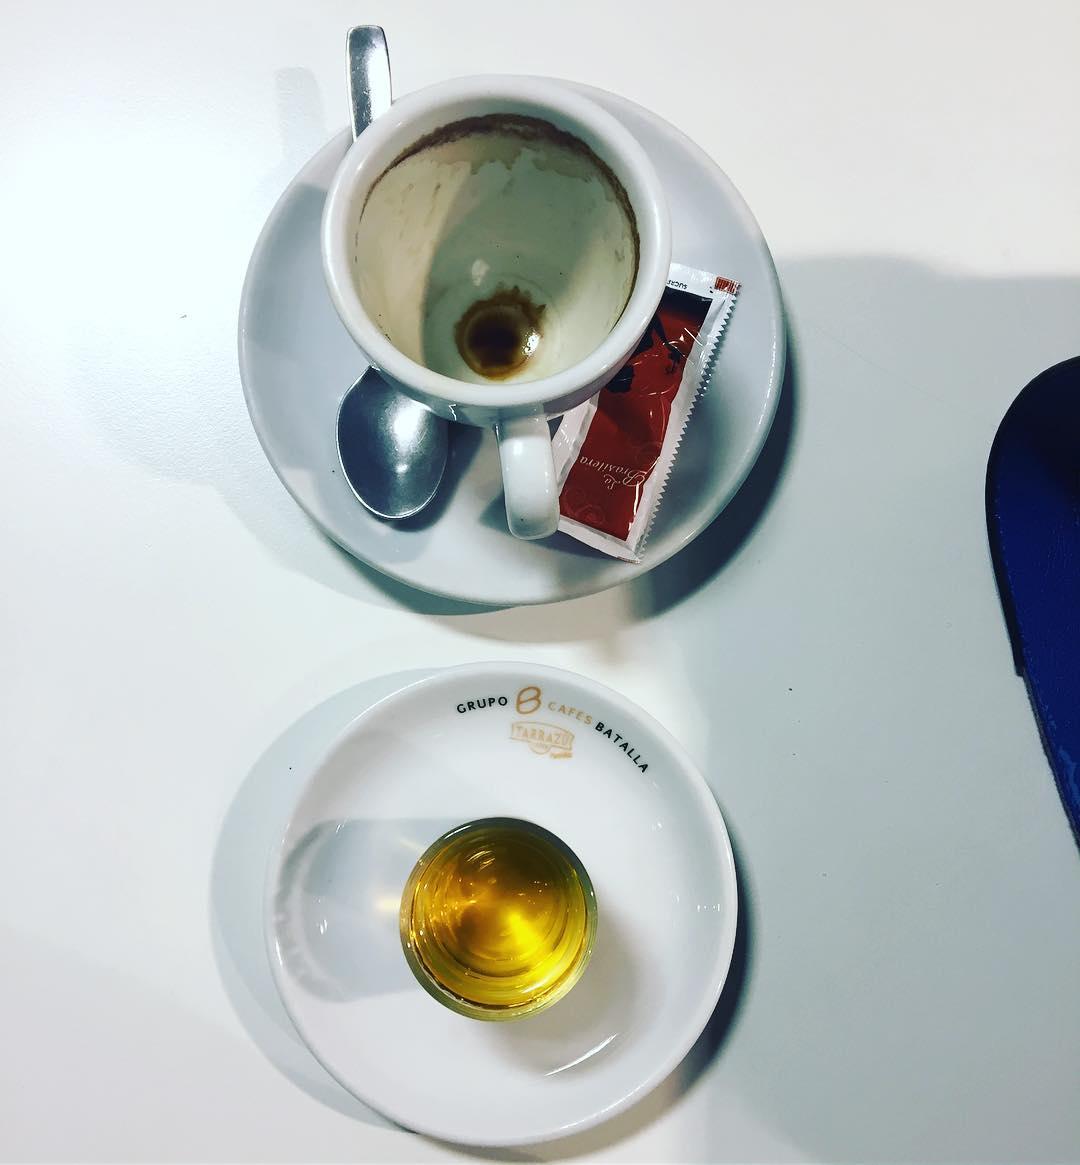 A veces la cafeína sola no apetece tanto tanto #coffee #addict #caffeine #yum #black #morning #bestcoffee #needcoffee #coffeeislove #coffeeislife #coffeegram #coffeelover #coffeeaddict #coffeetime #lattemug #coffeemug #onecupatatime #americano #instacoffee #expreso #amantedelcafe #instagood #coffeedate